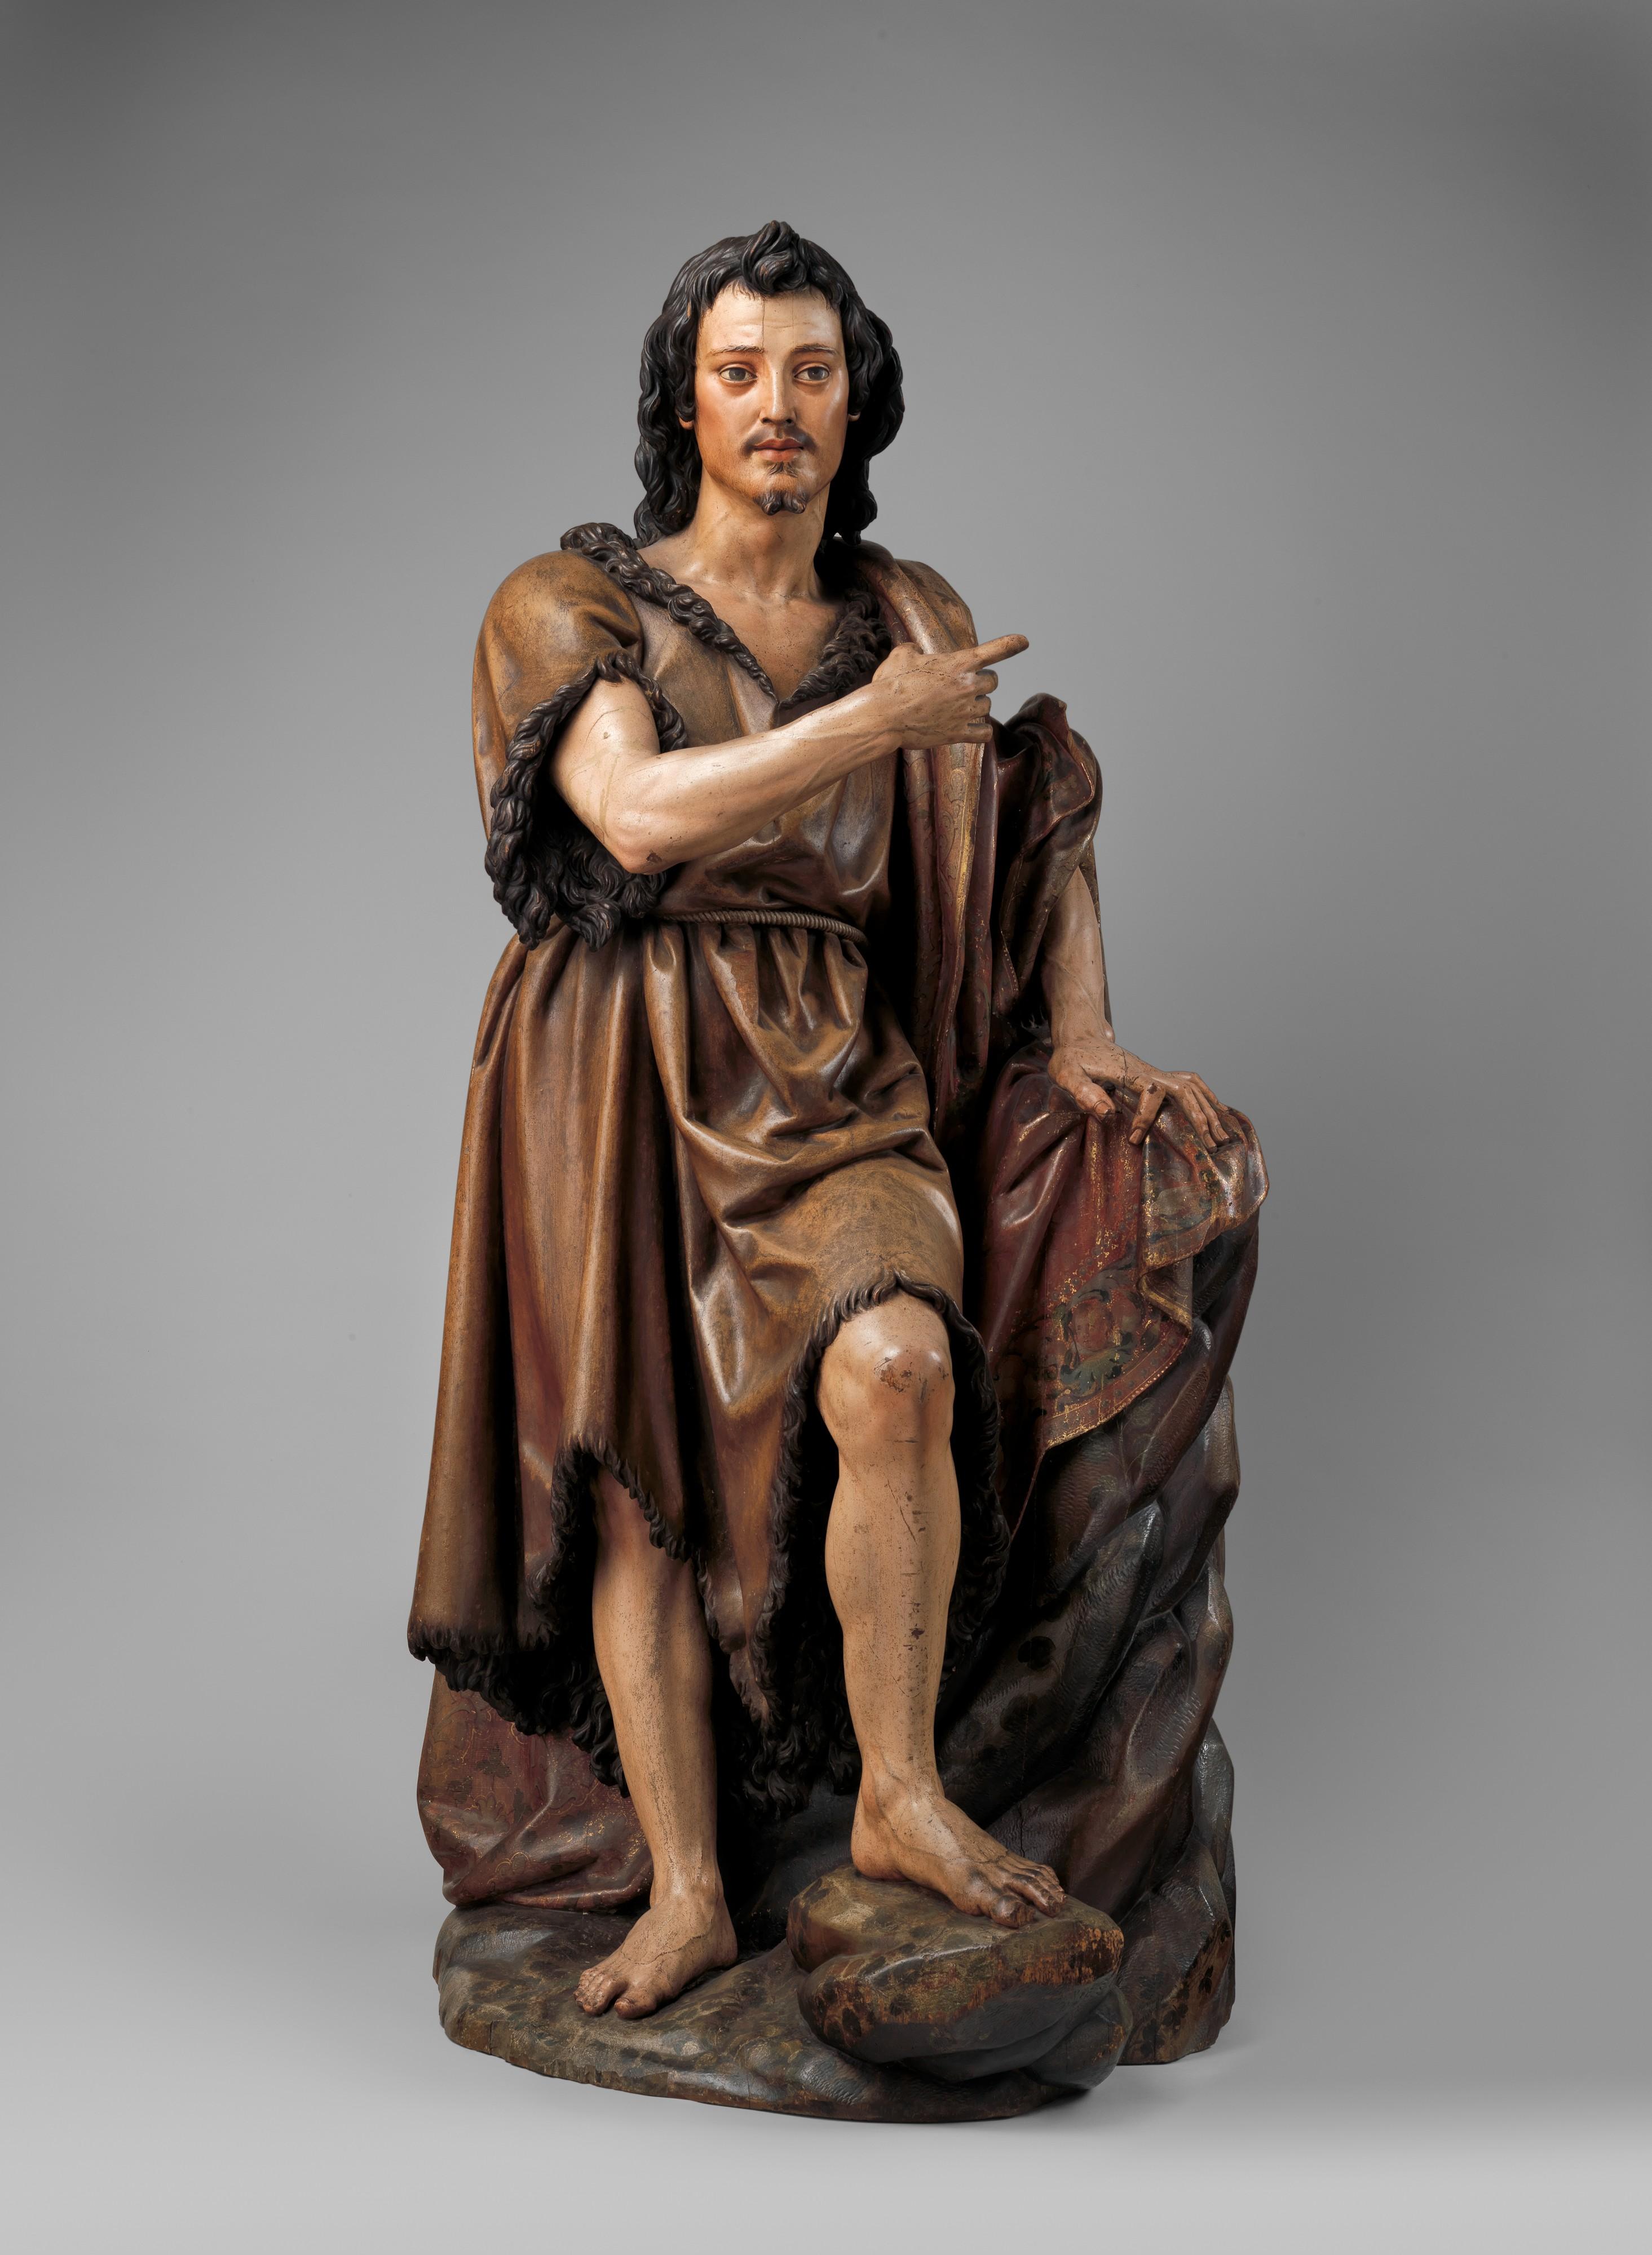 https://images.metmuseum.org/CRDImages/es/original/DP249462.jpg